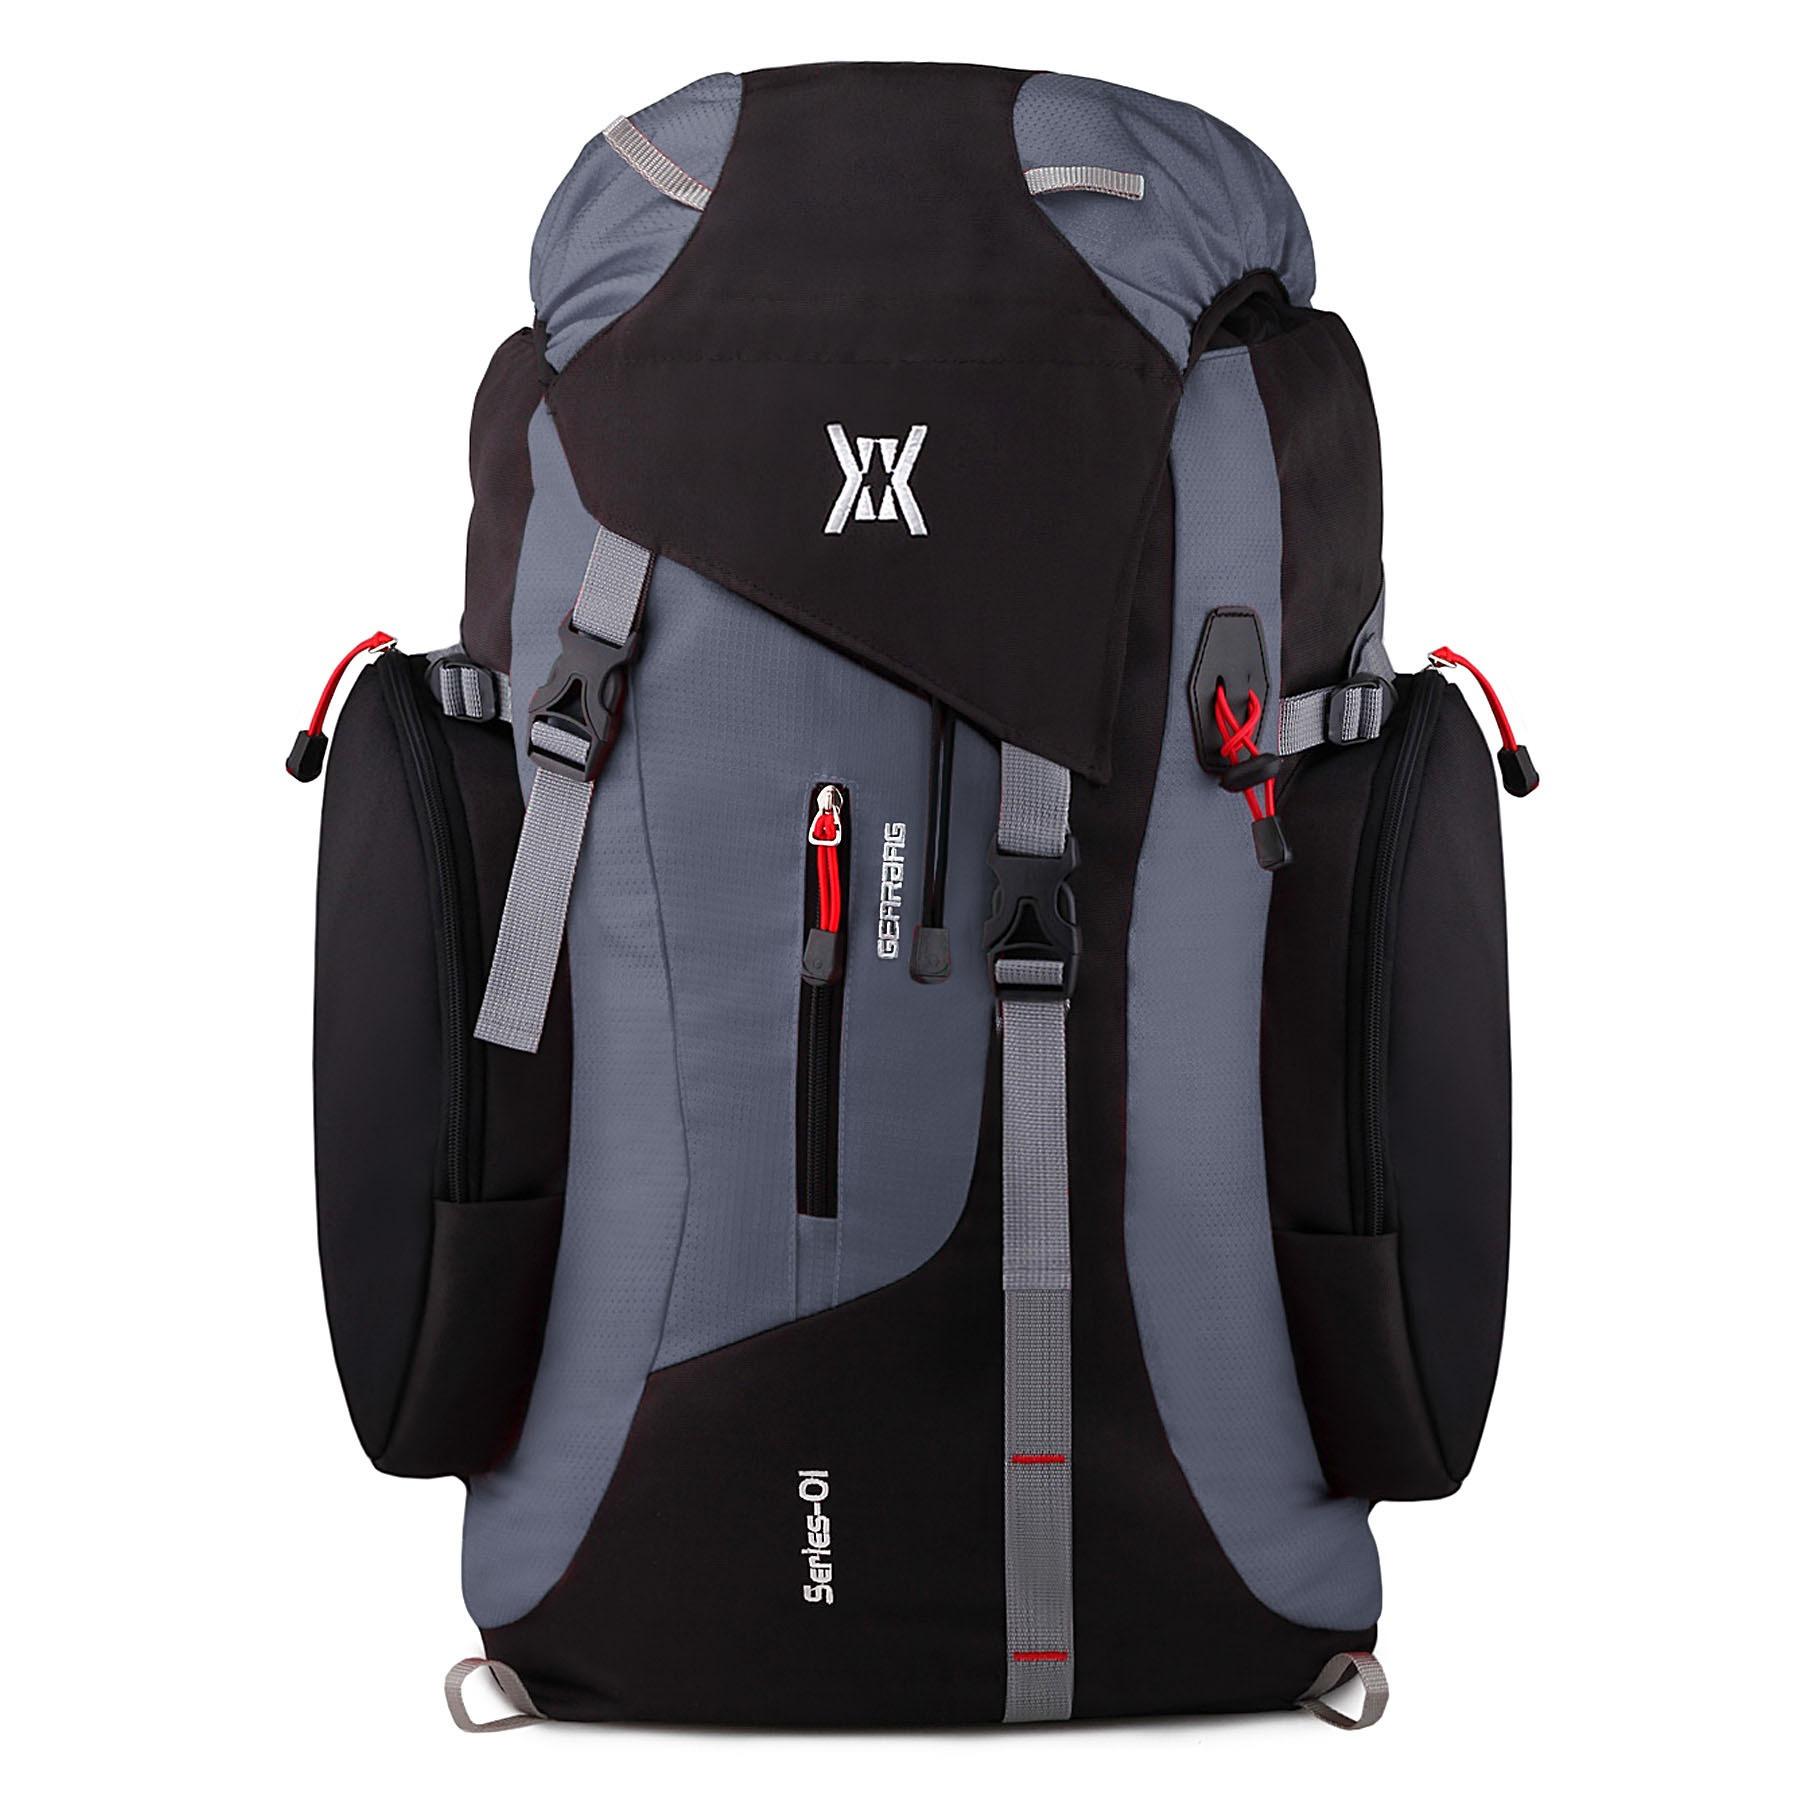 Gear Bag Alabanias Adventure Backpack Midnight Free Gear Bag Crow X Source · Jual Busi Livina